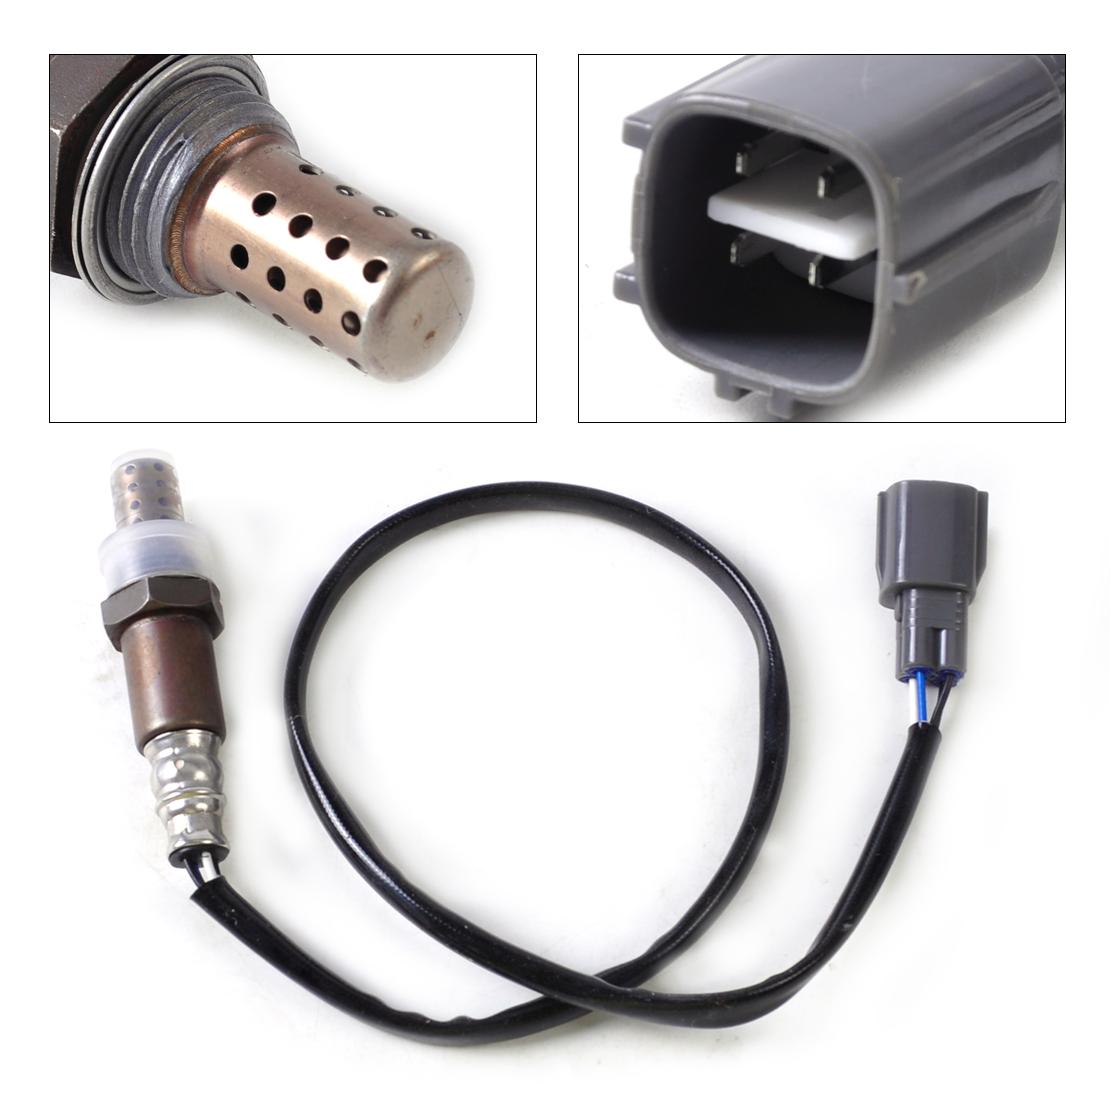 oxygen sensor 12231589 for toyota avalon camry corolla rav4 sienna venza lexus es350 pontiac scion